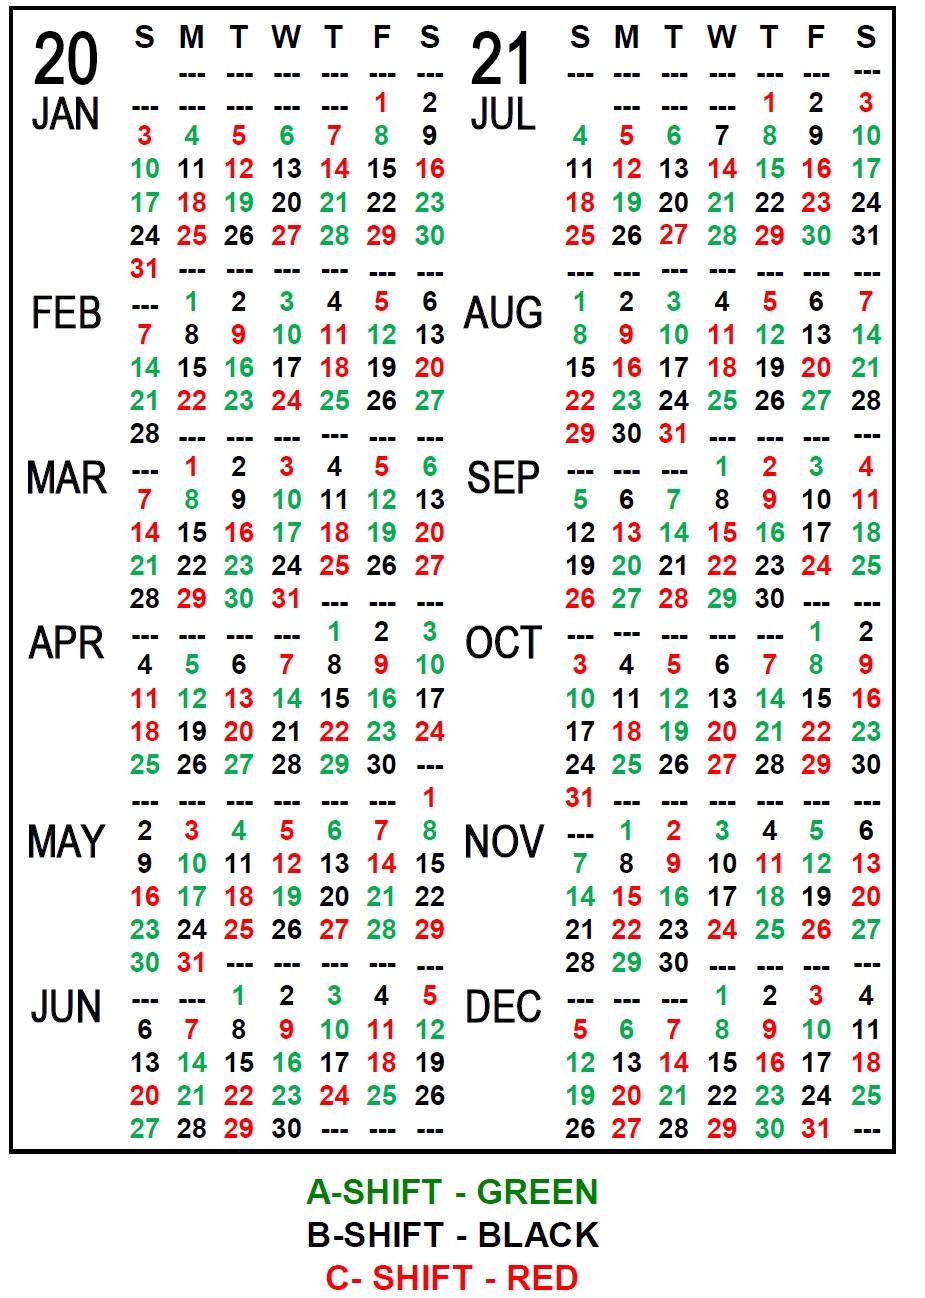 Firefighter Shift Calendar 2020 - Wpa.wpart.co Regarding